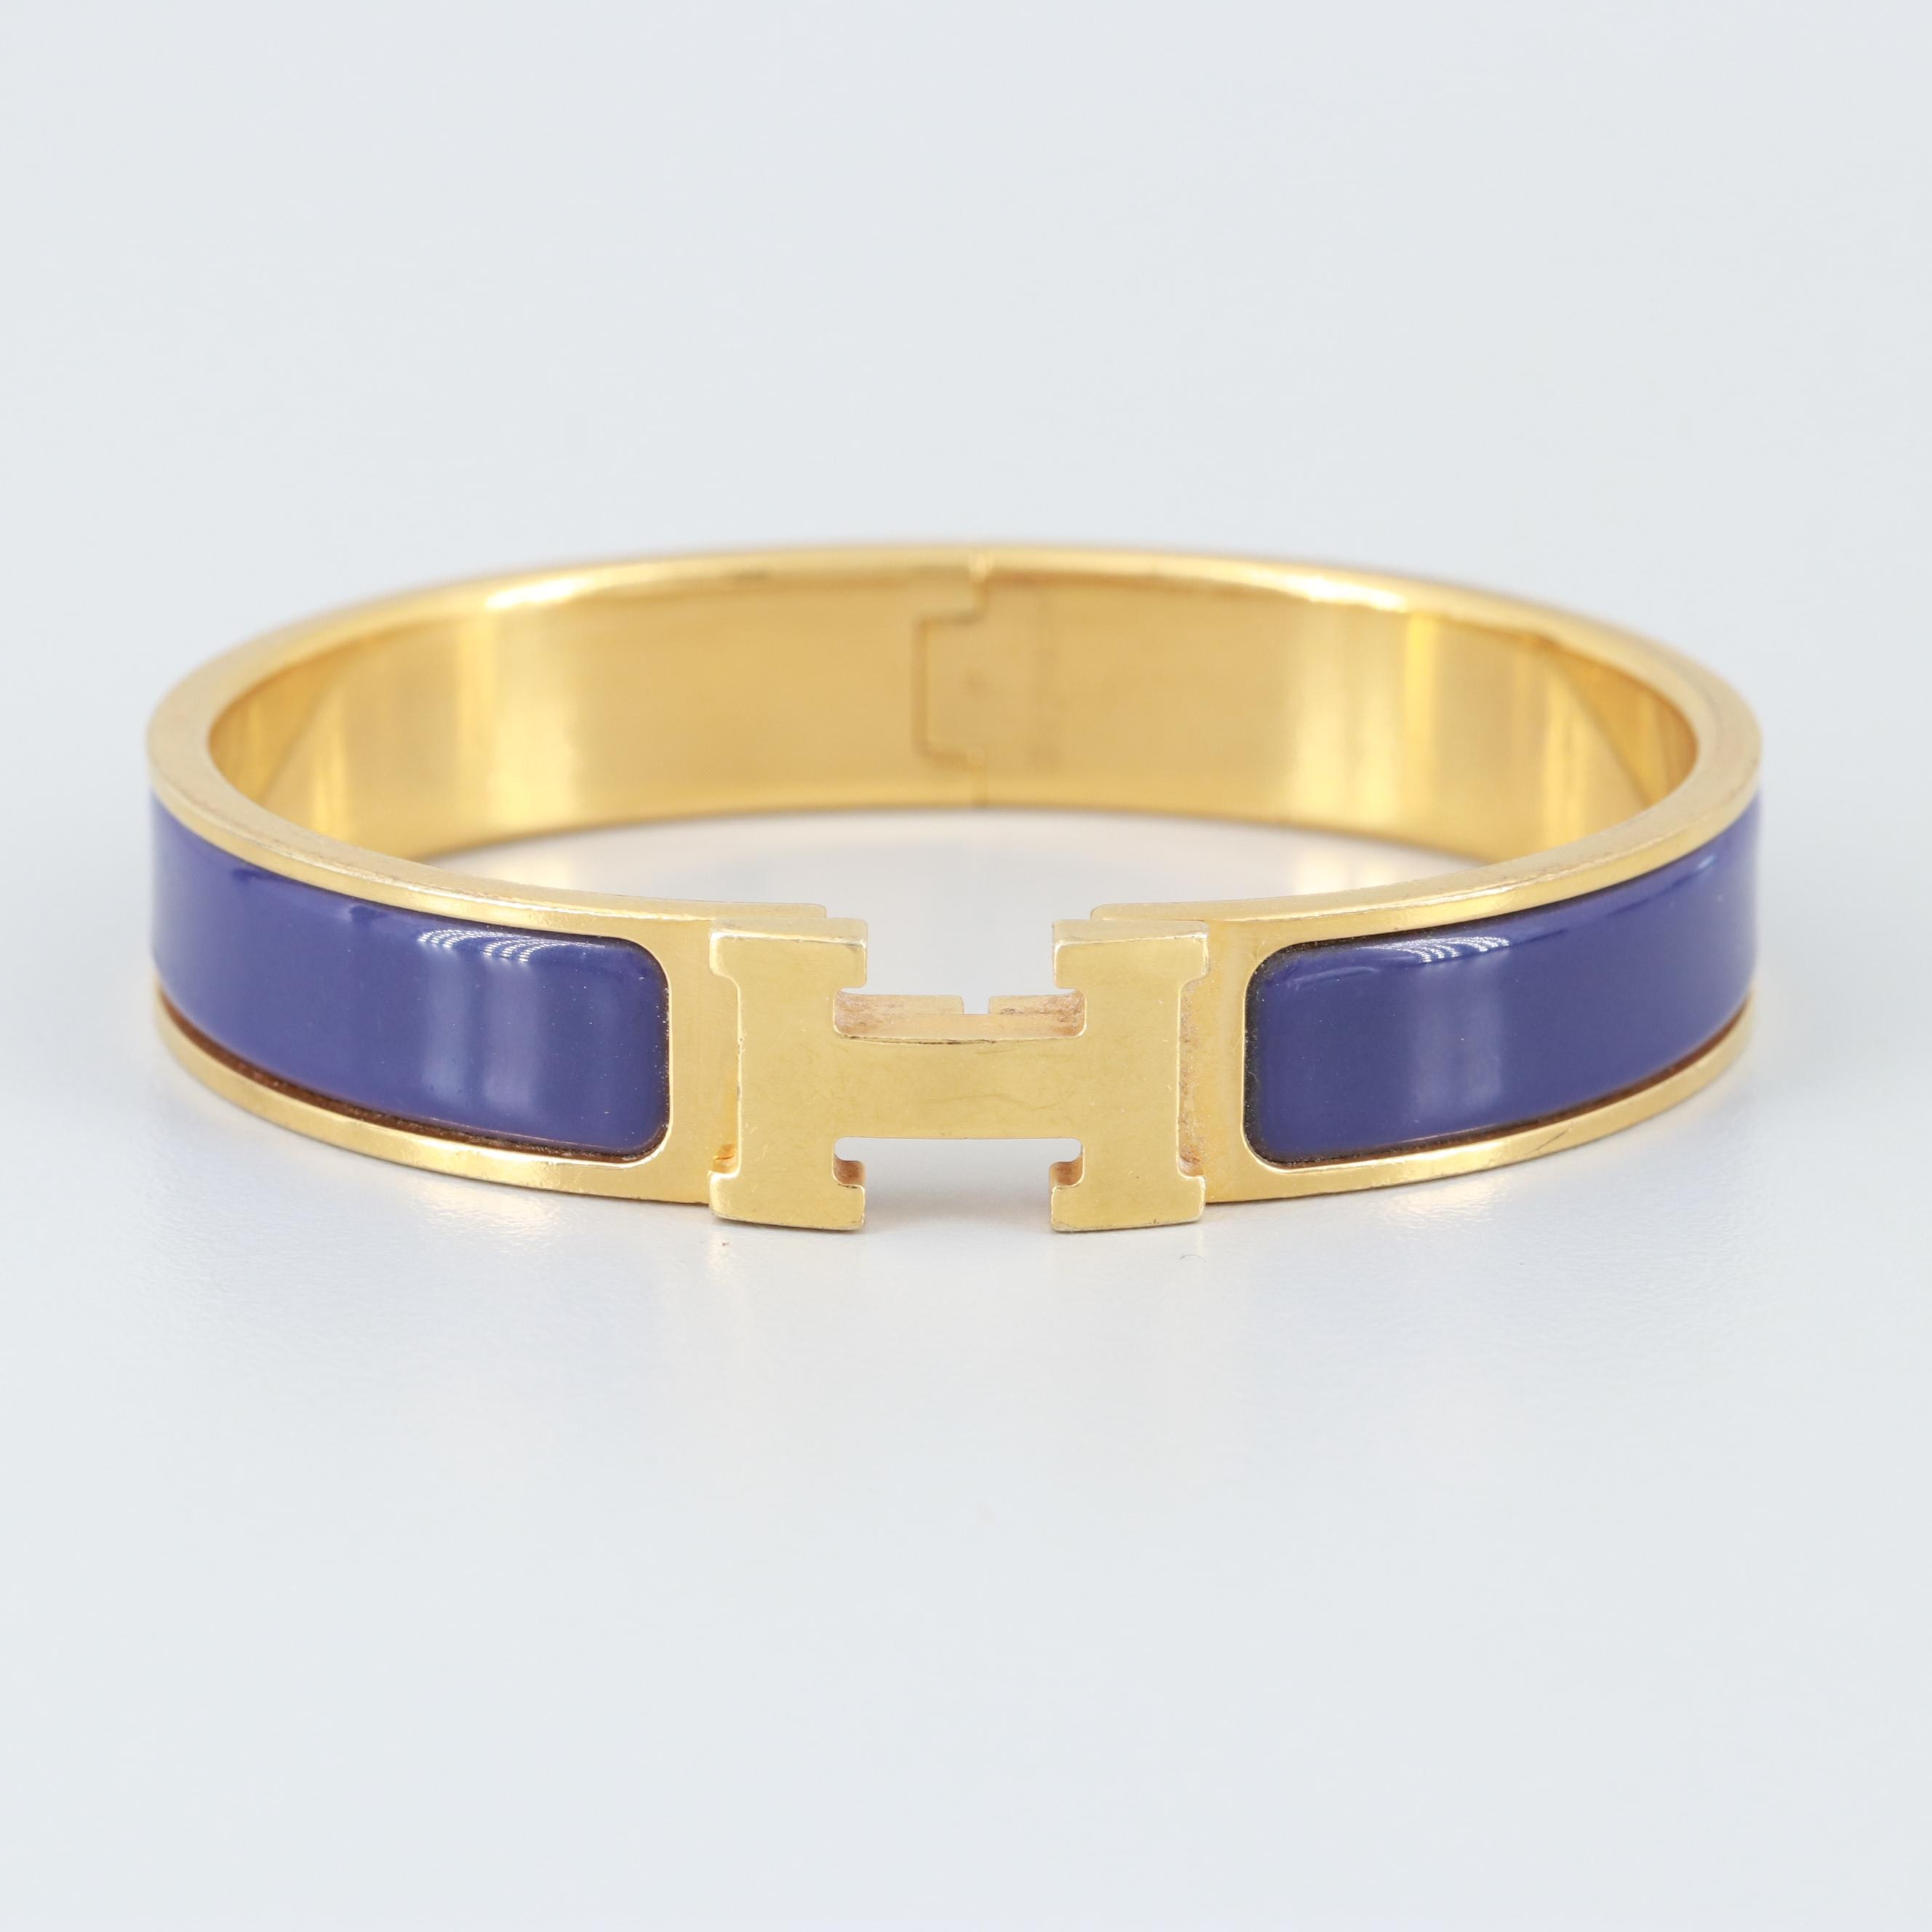 "Hermès Gold Tone Enamel Hinged Bangle ""Clic Clac H"" Bracelet"